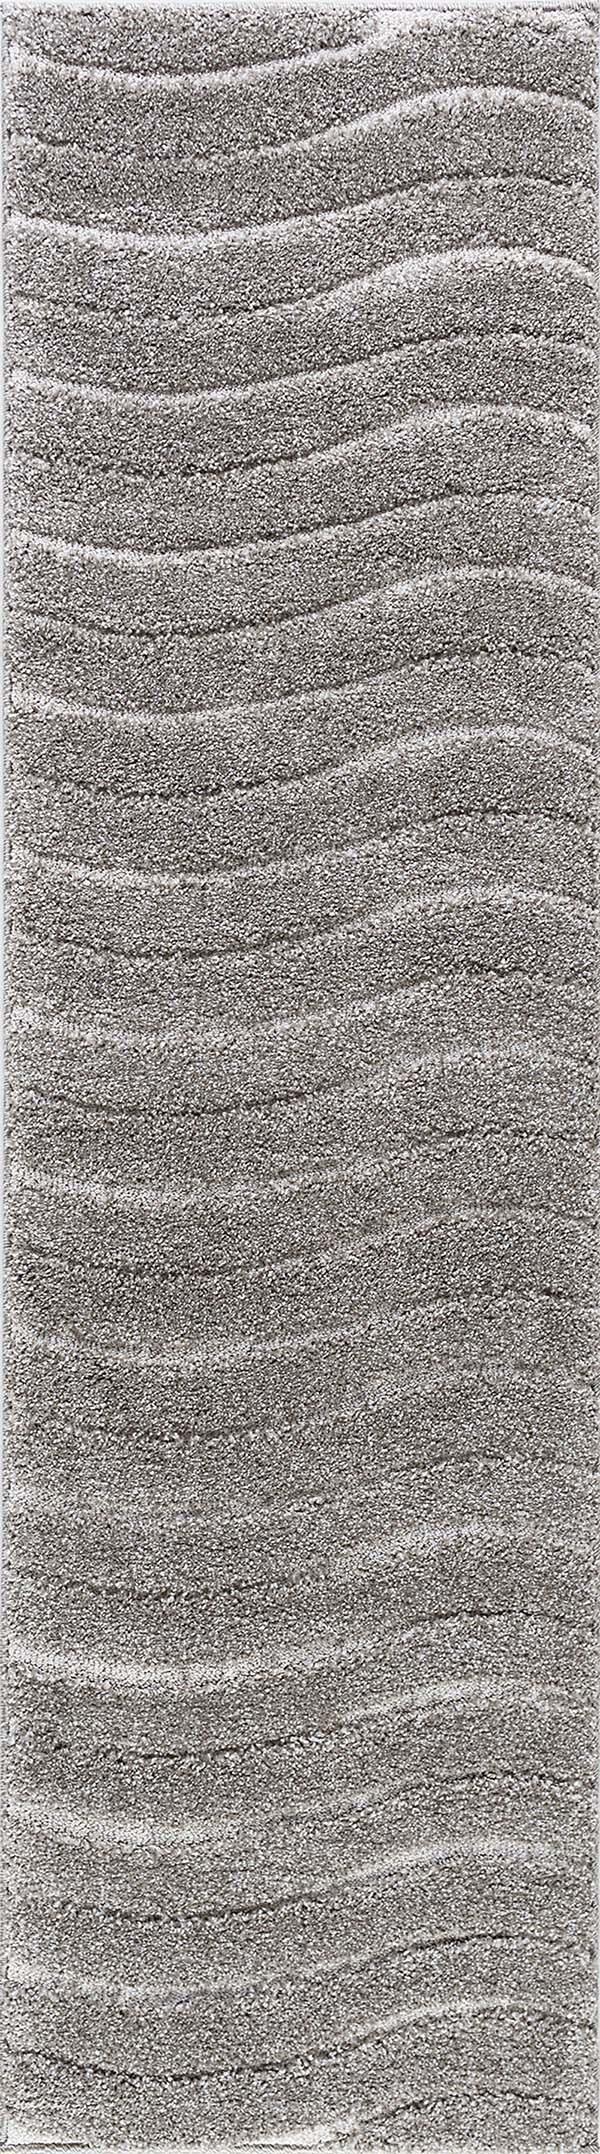 Taupe, Grey (BRK-1309) Shag Area Rug